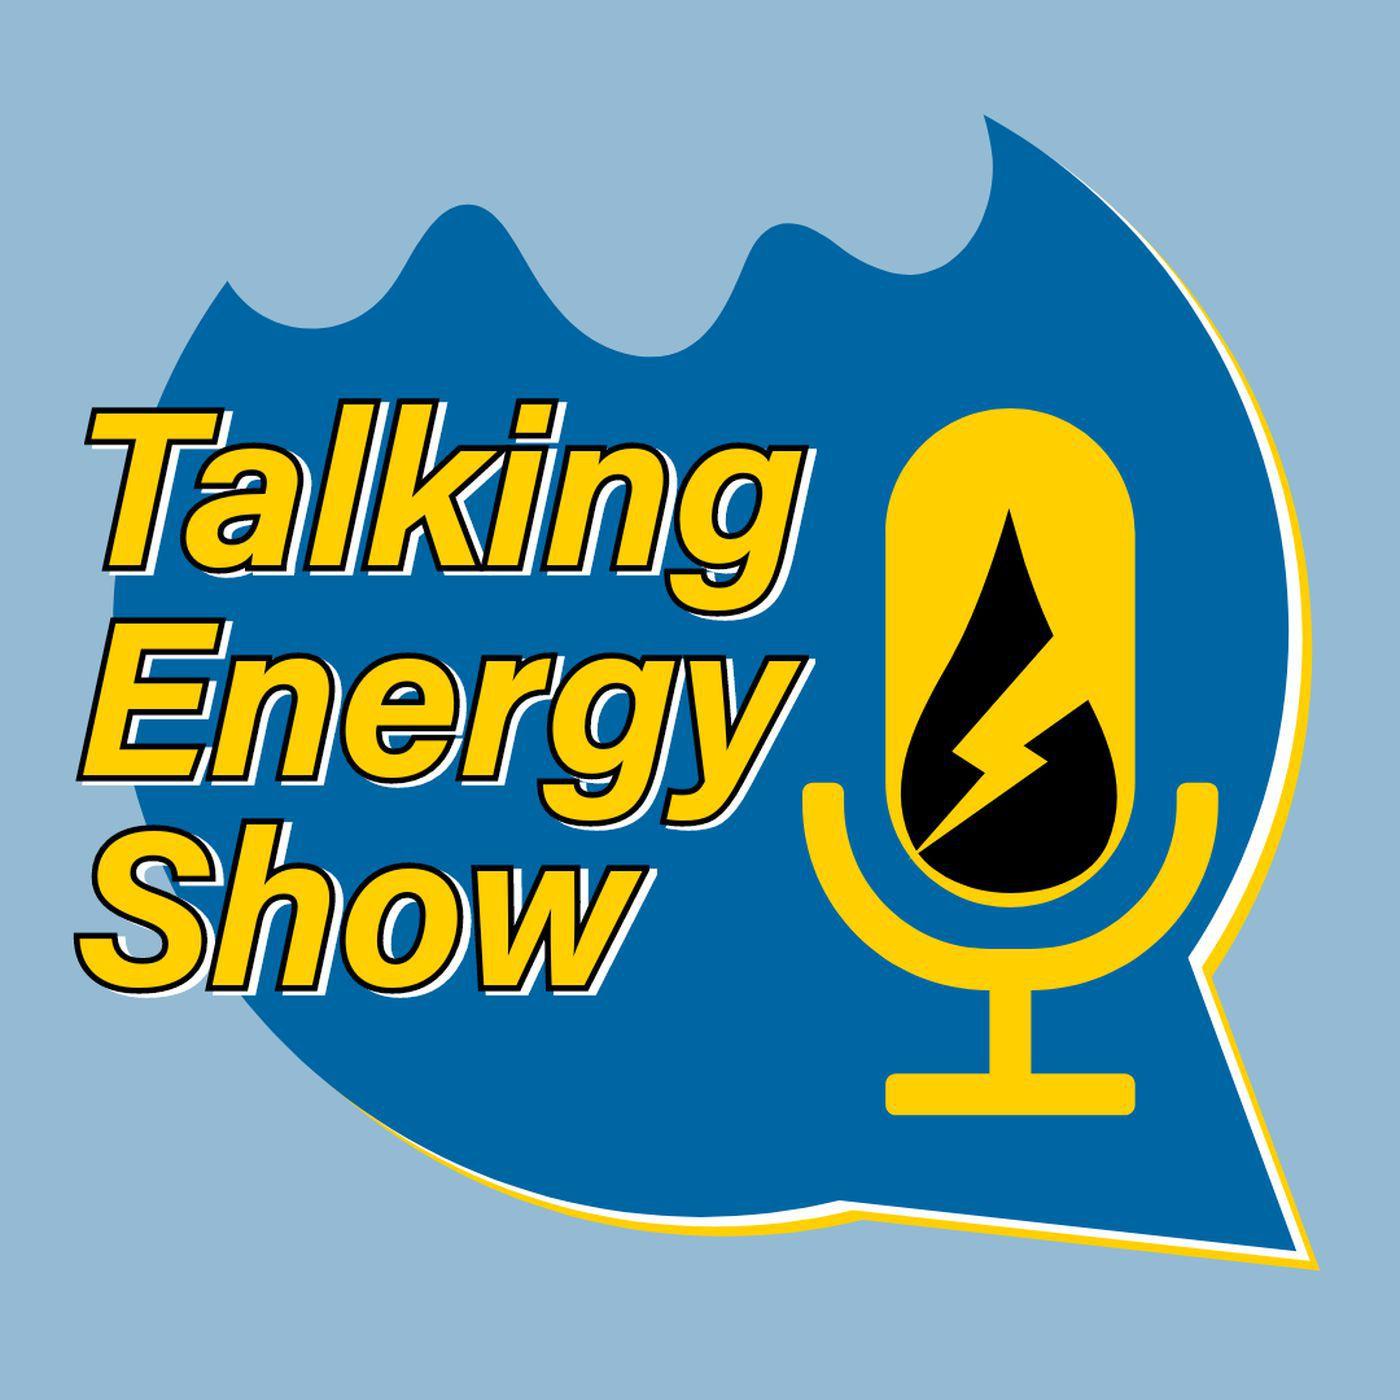 Talking Energy Show